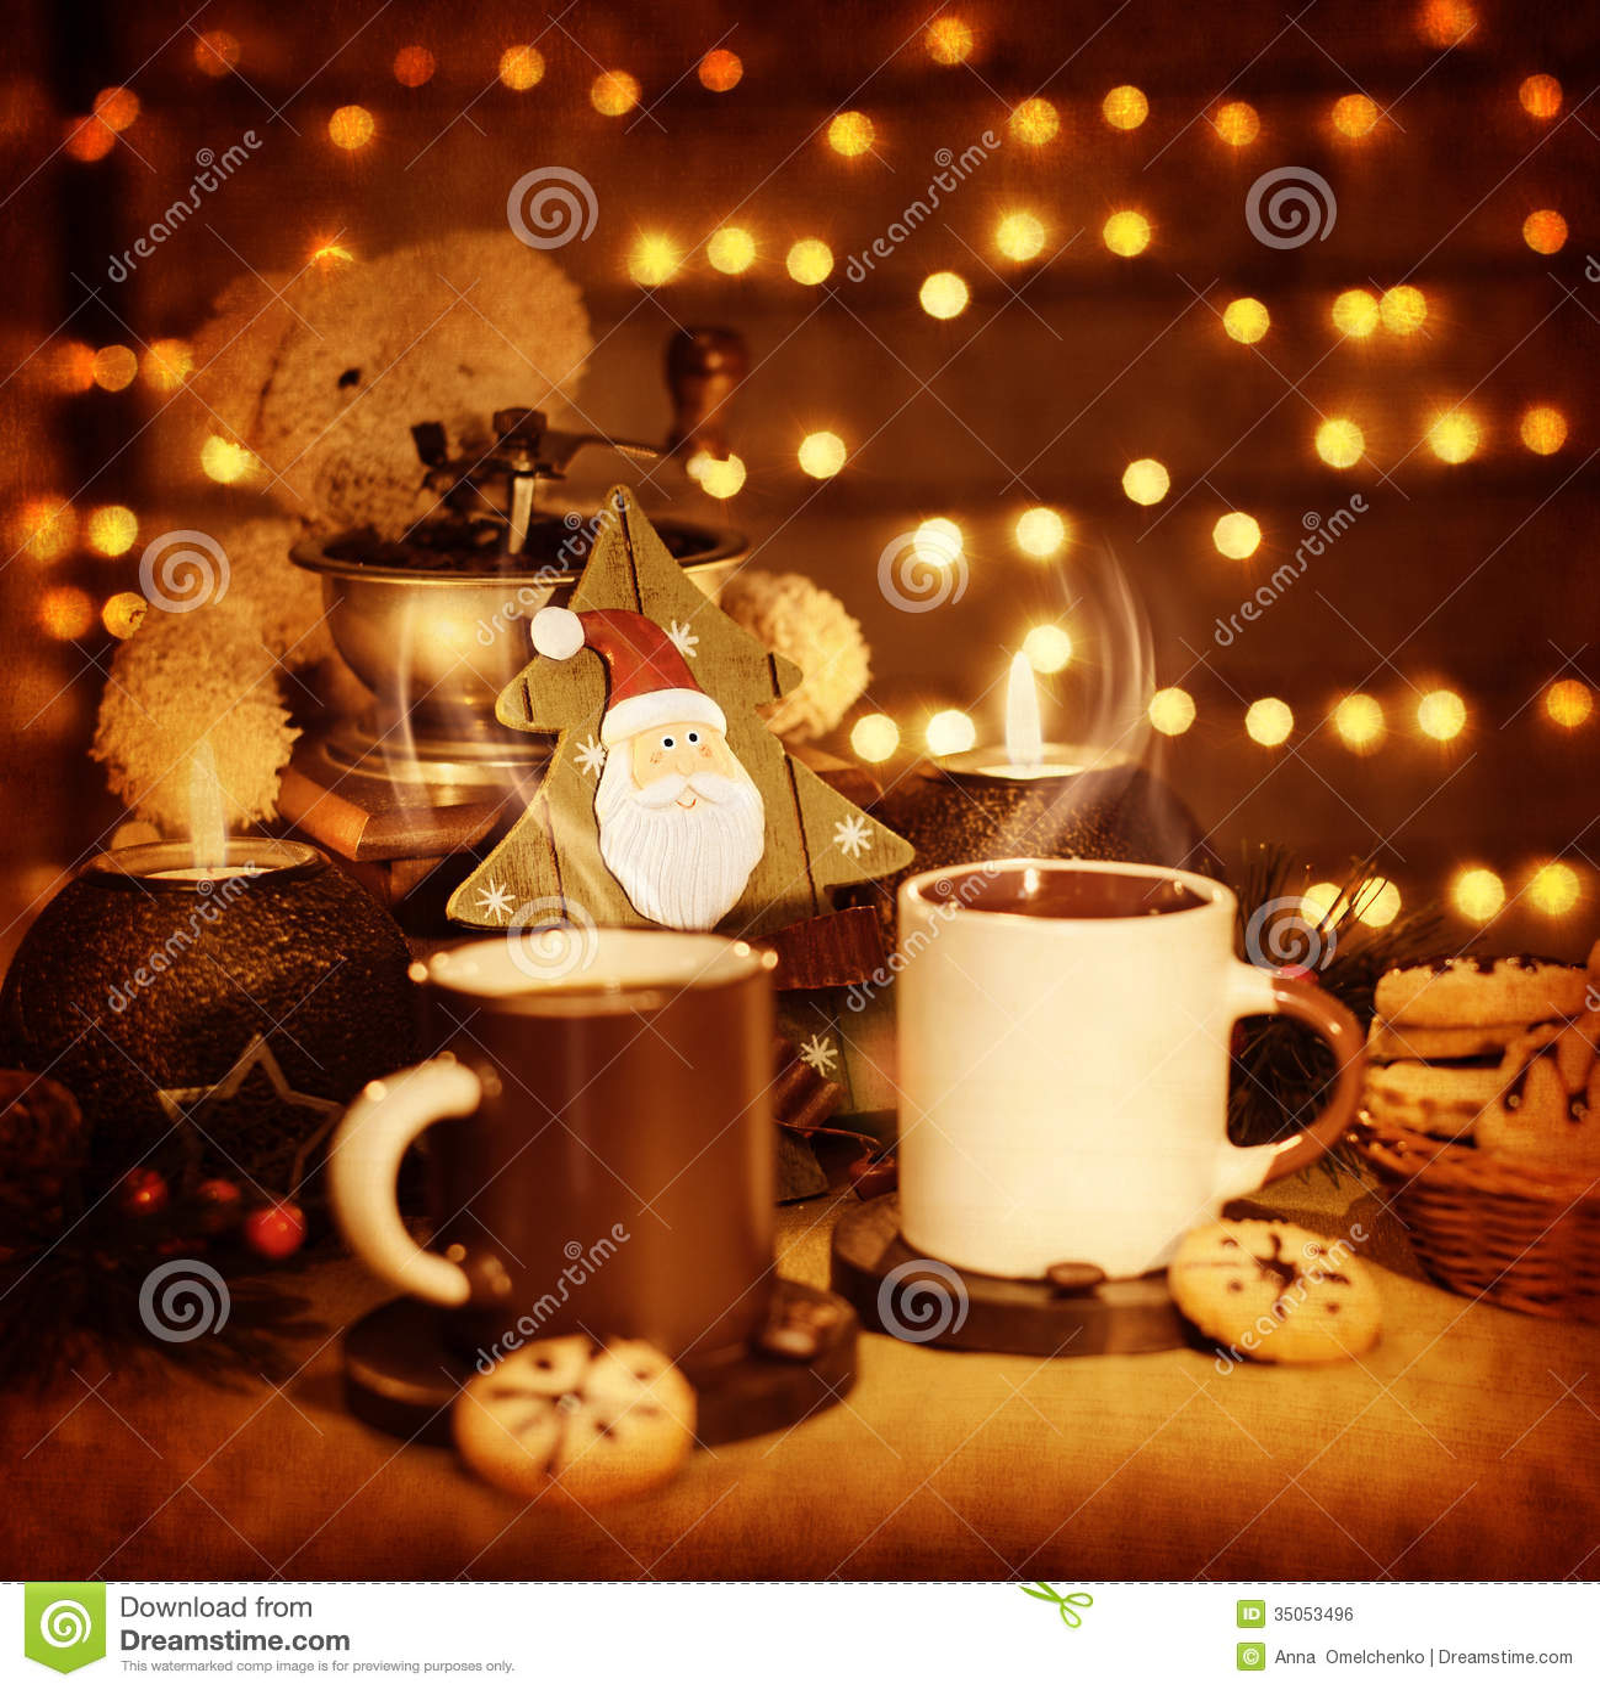 Starbucks Wallpaper Cute Christmas Still Life Royalty Free Stock Image Image